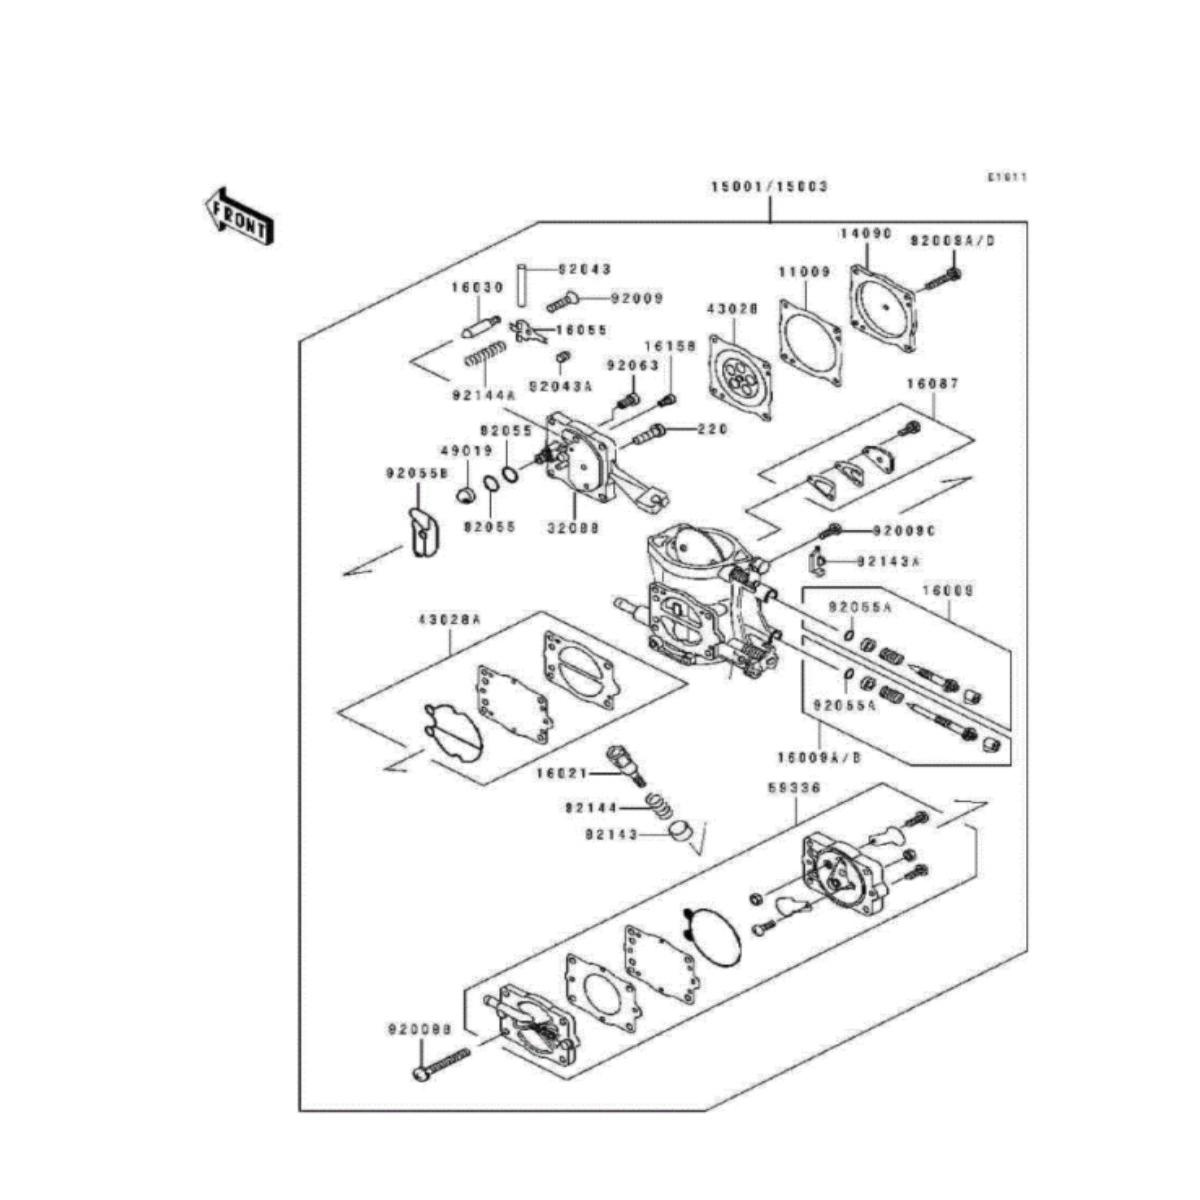 Reparo Carburador para Jet Ski Kawasaki 38/40/42 Keihin  - Radical Peças - Peças para Jet Ski